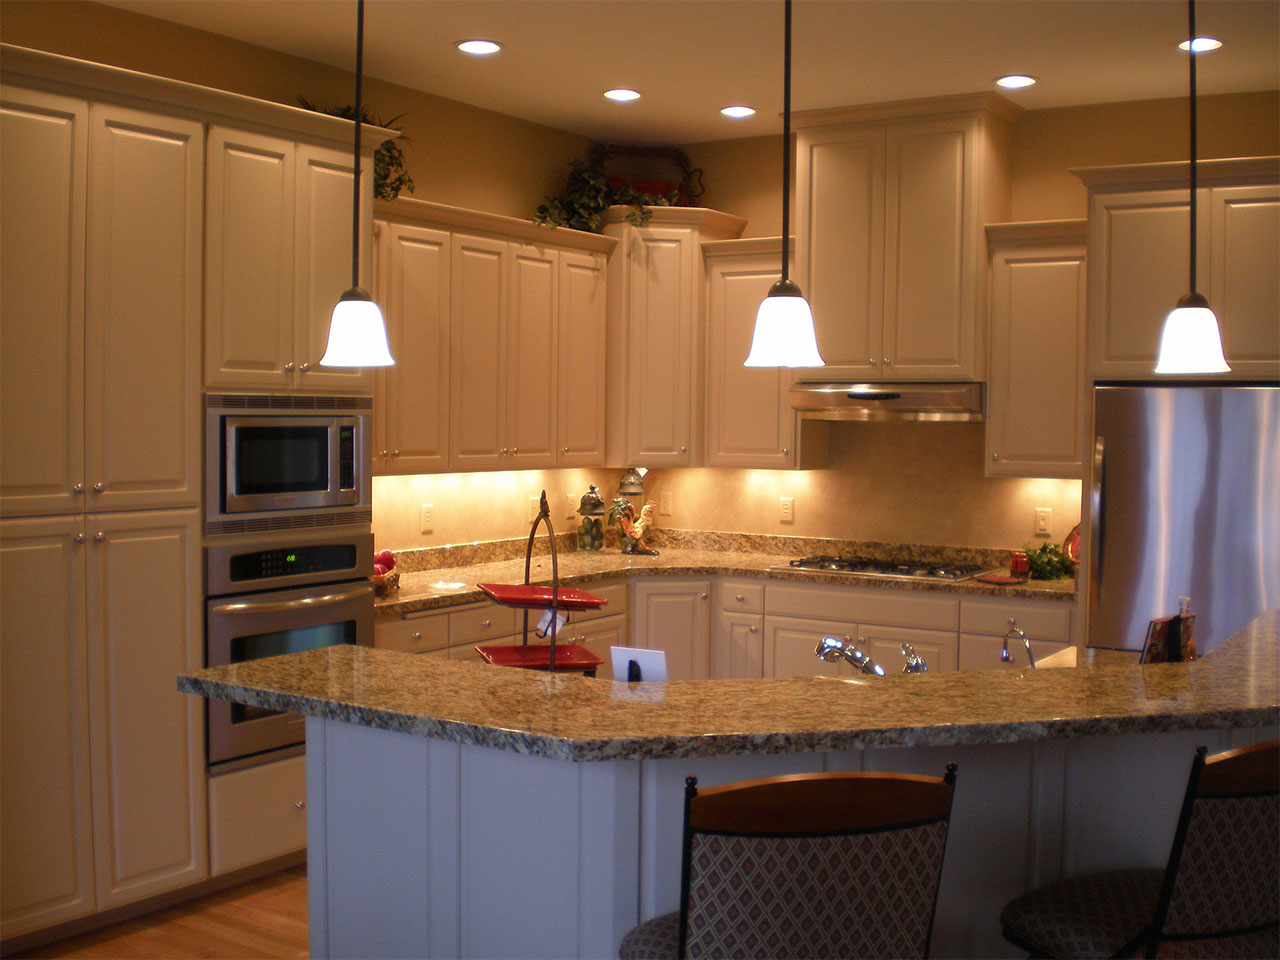 kaufman-homes-custom-home-bradford-7